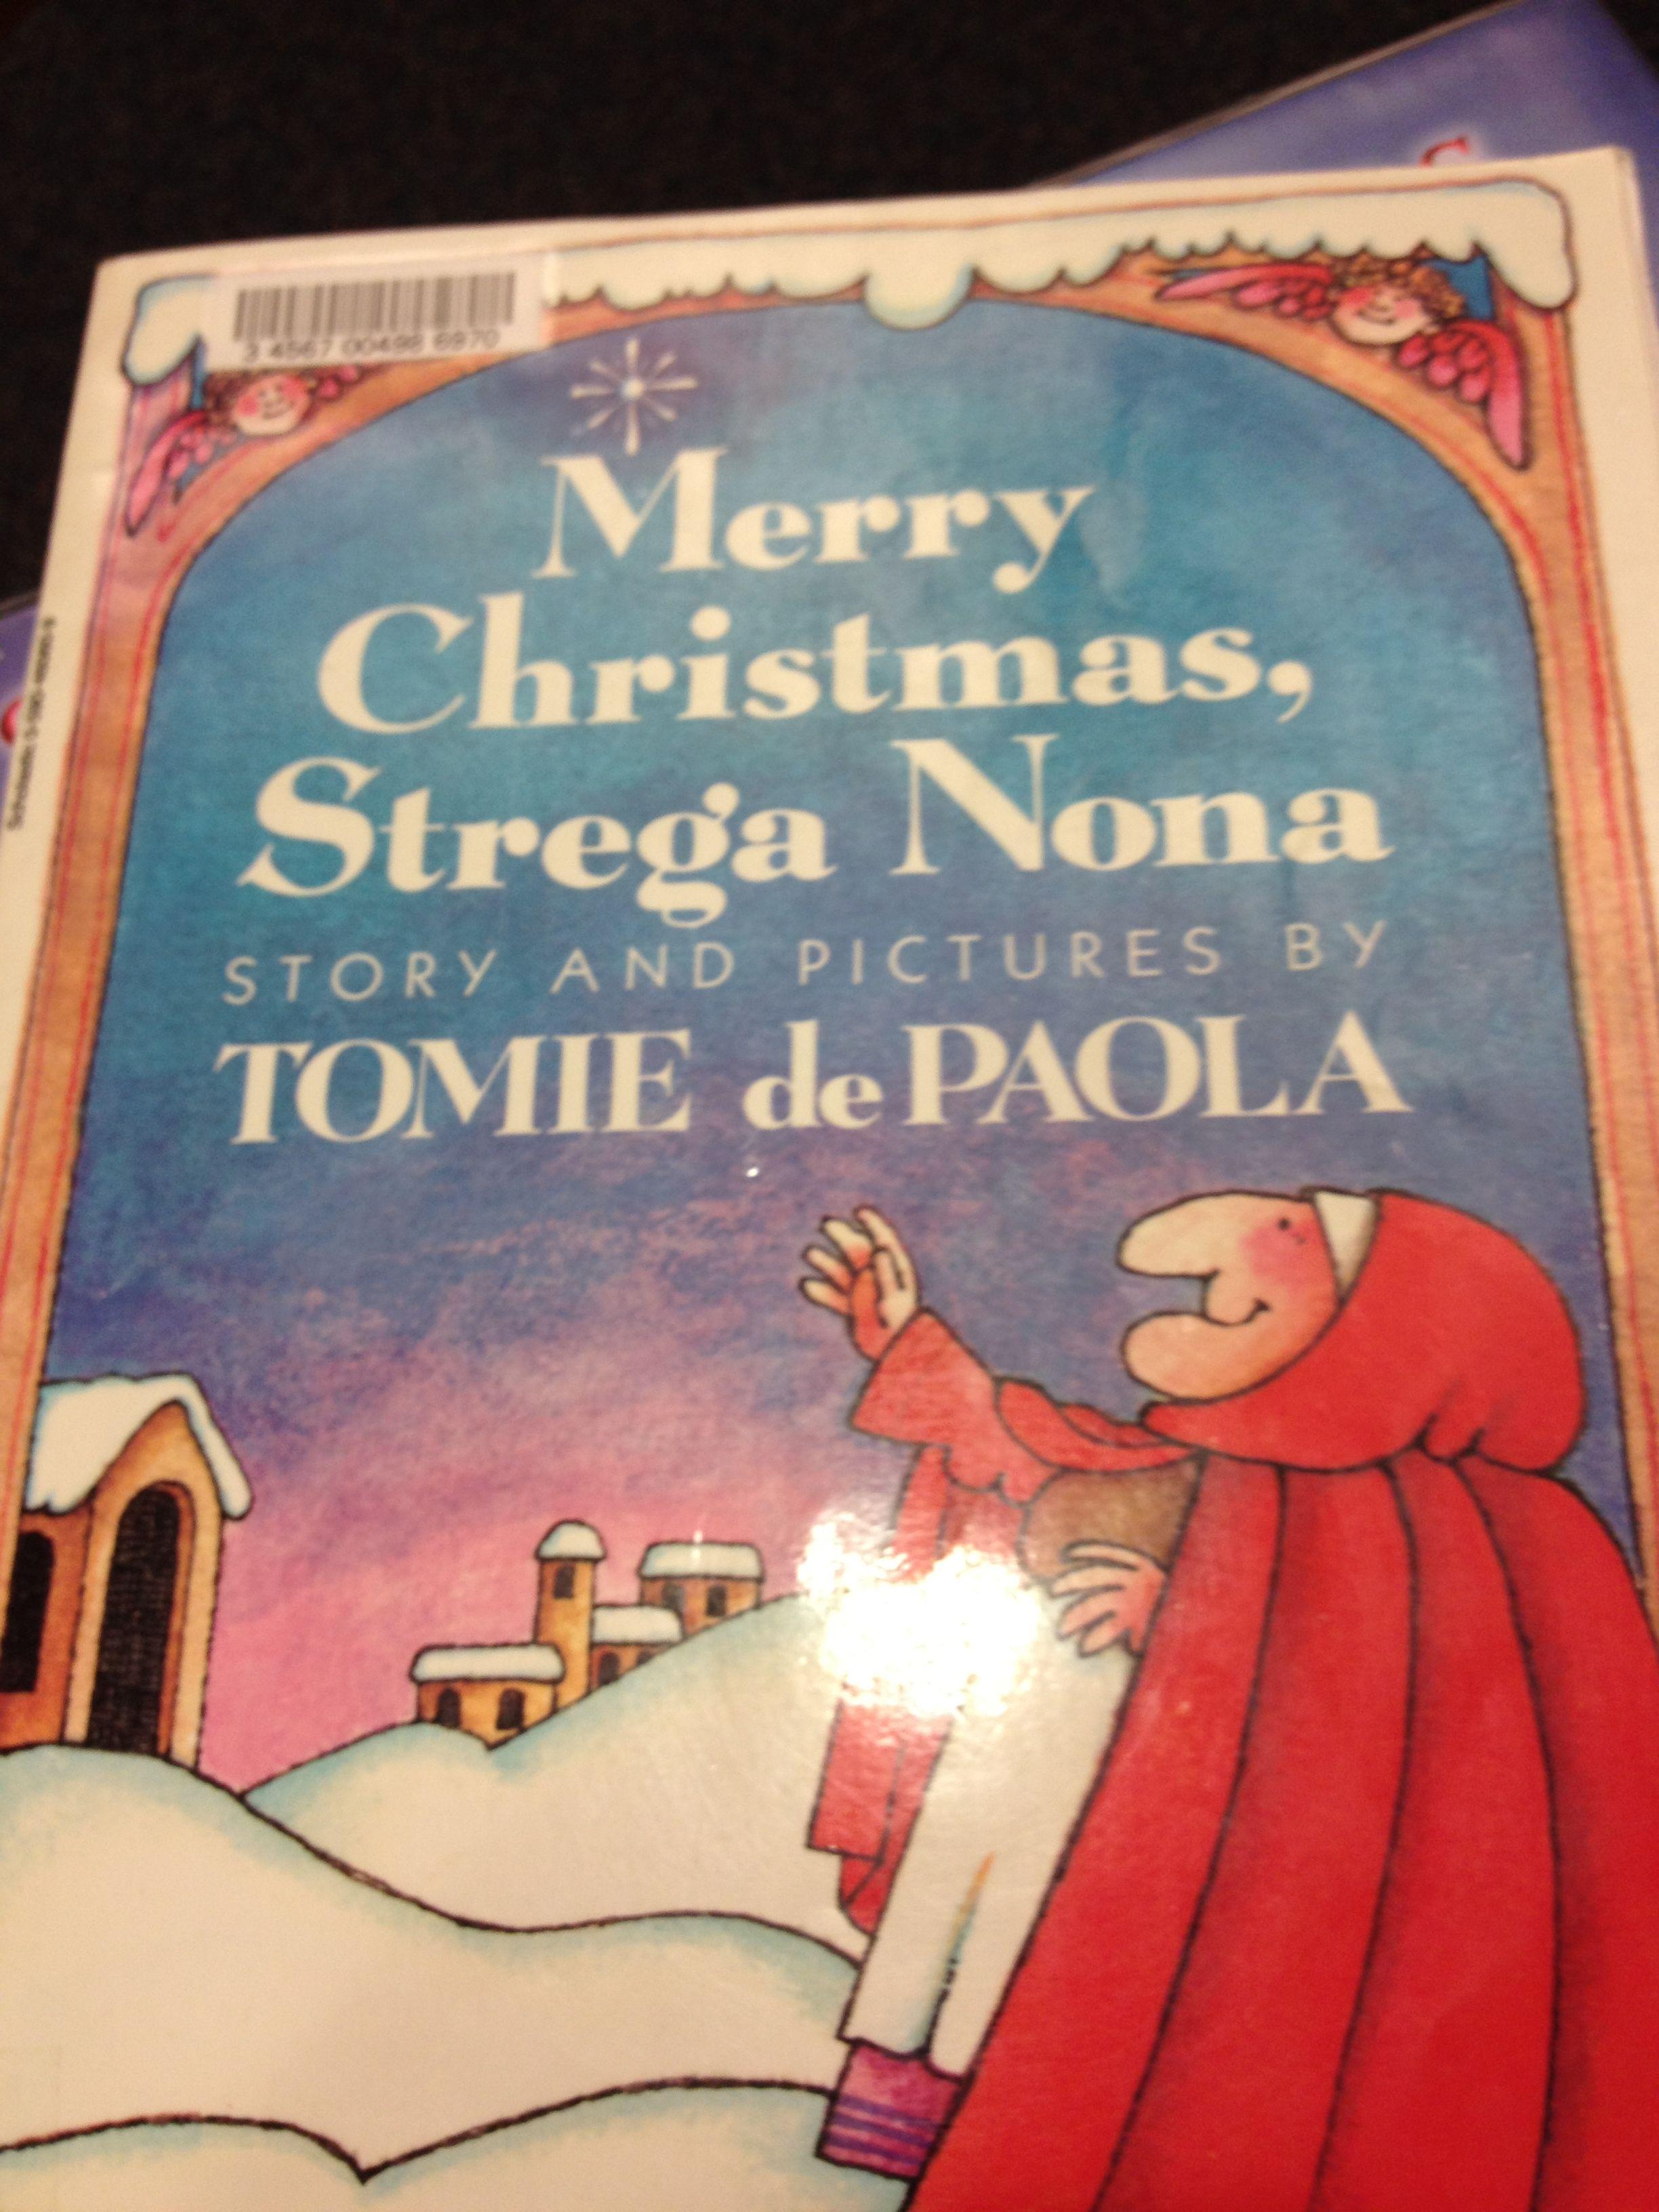 Merry Christmas Strega Nona